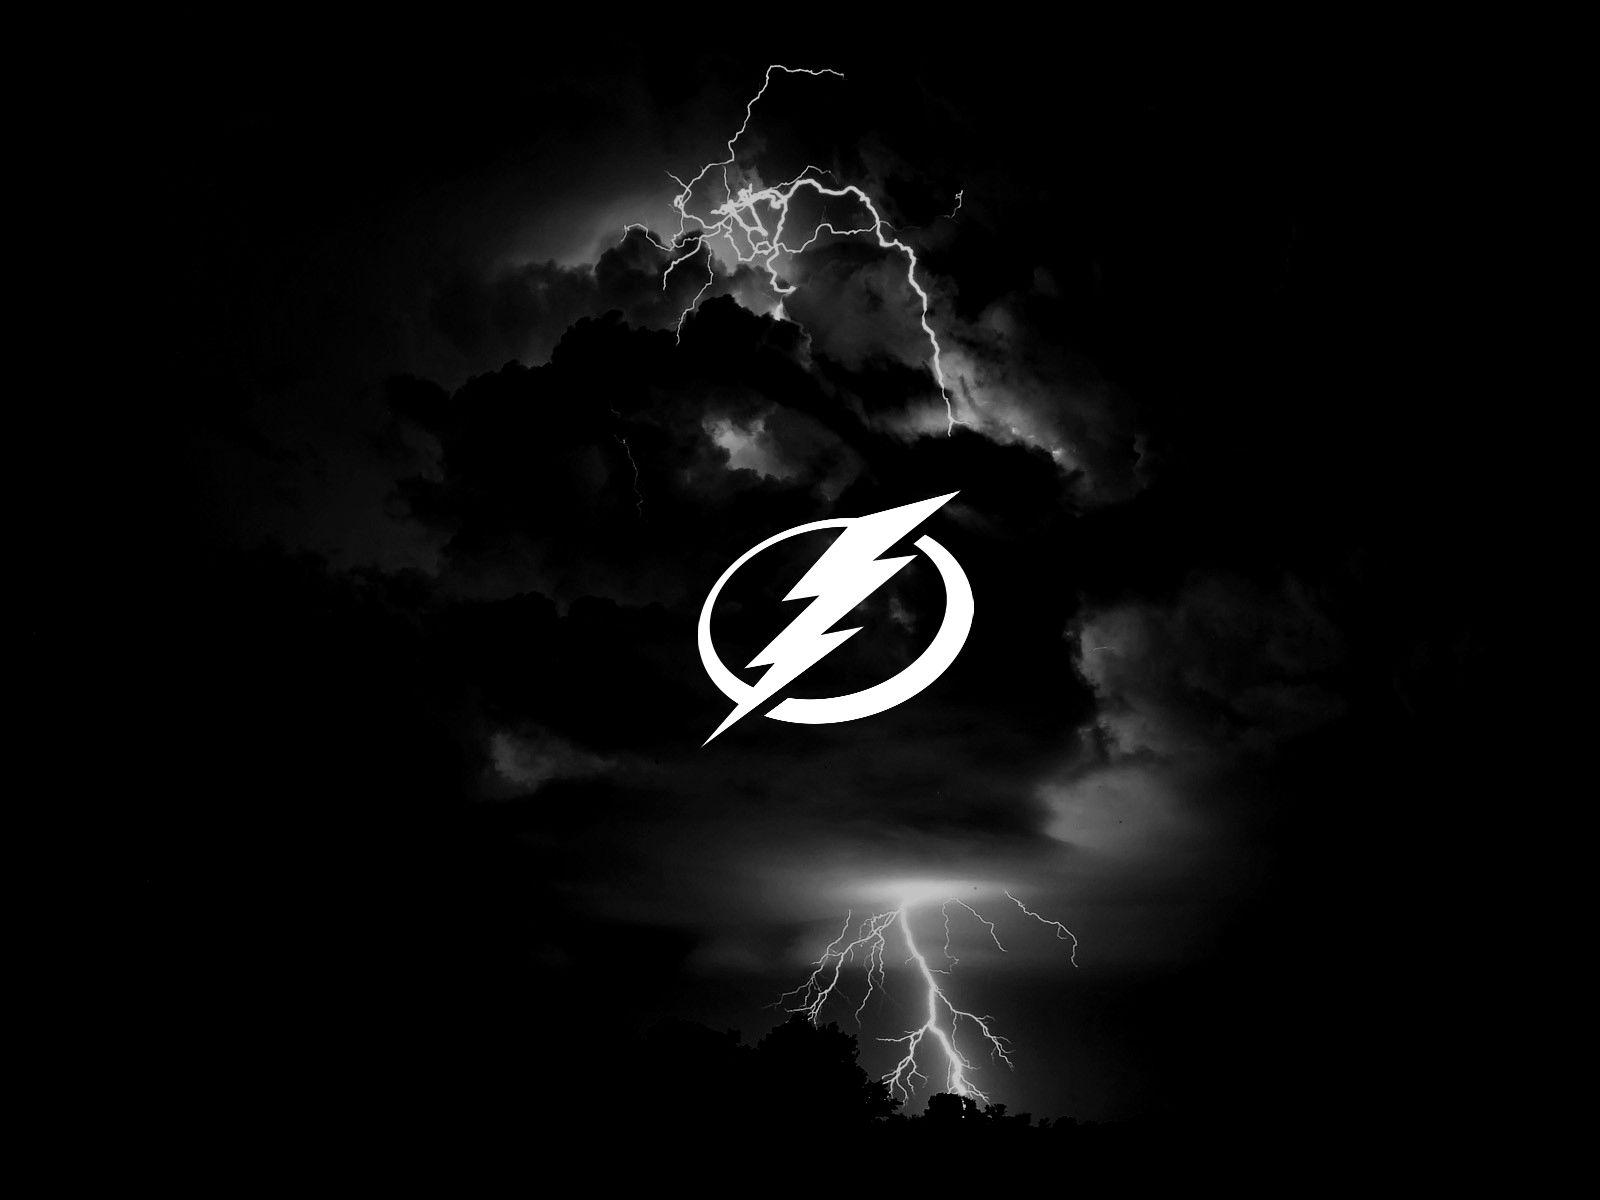 Black Lightning Wallpaper 7 1600 X 1200 Stmed Net Tampa Bay Lightning Hockey Tampa Bay Tampa Bay Lighting